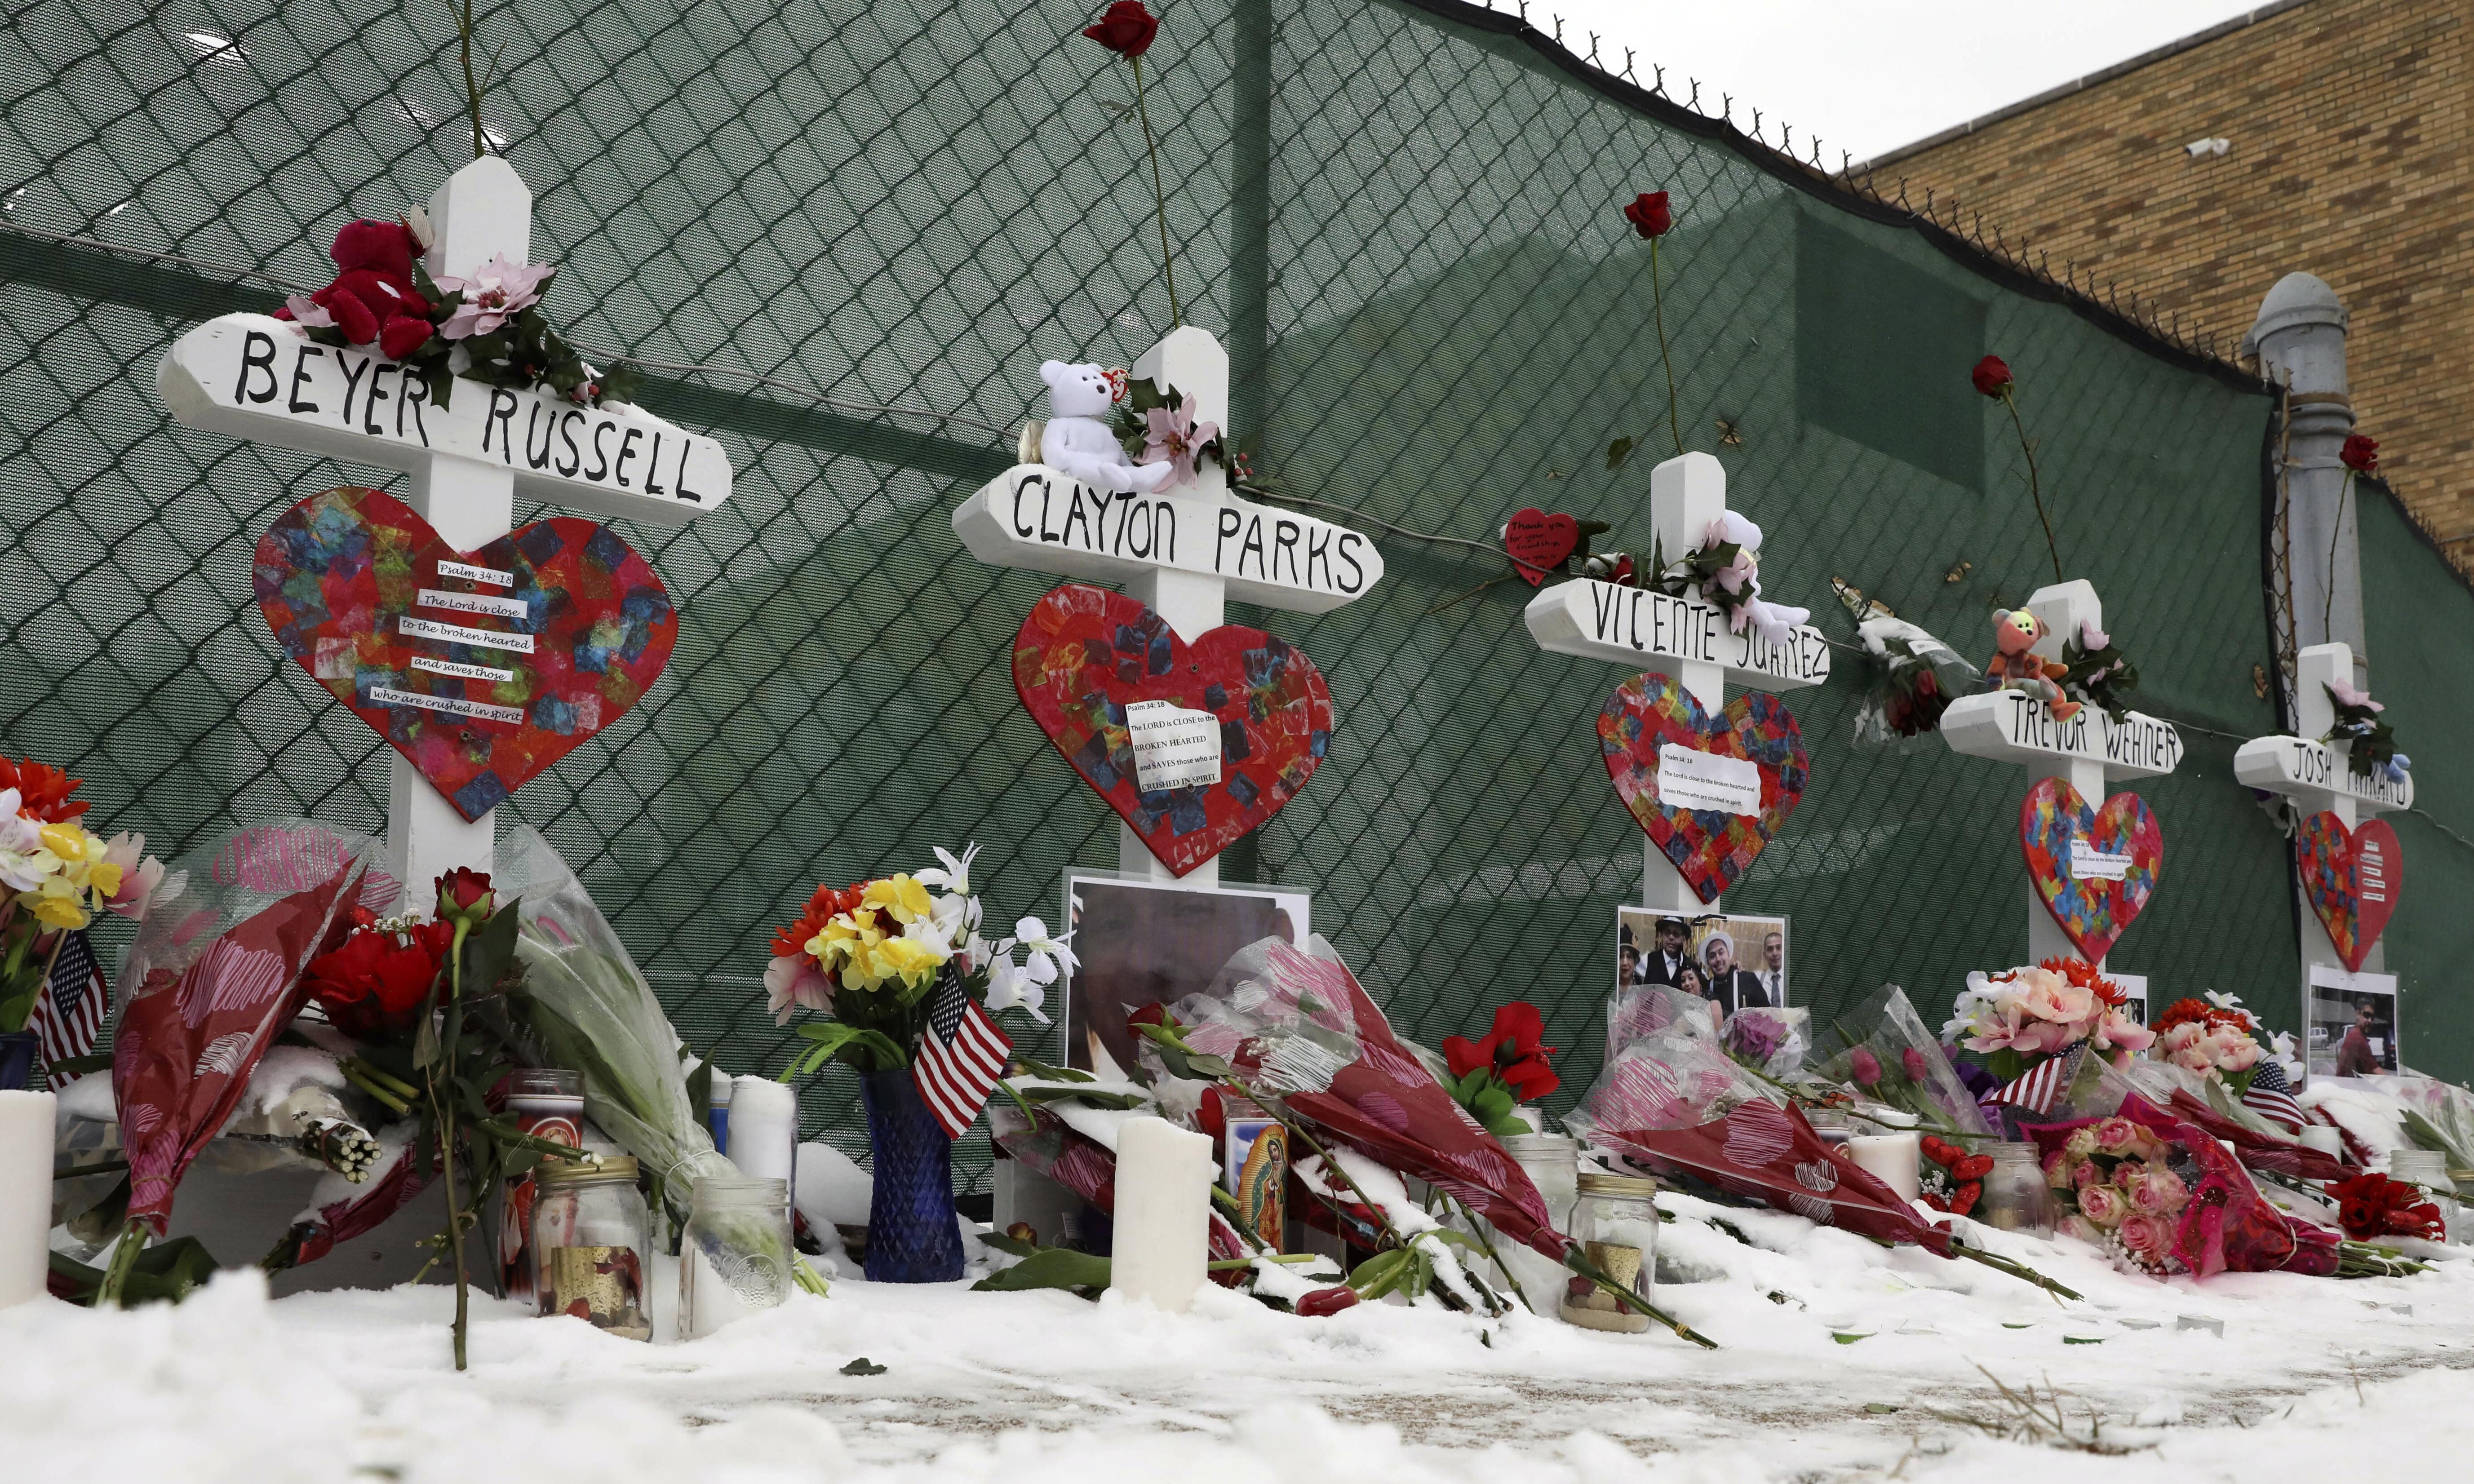 Aurora shooting: background check failures let gunman keep firearm